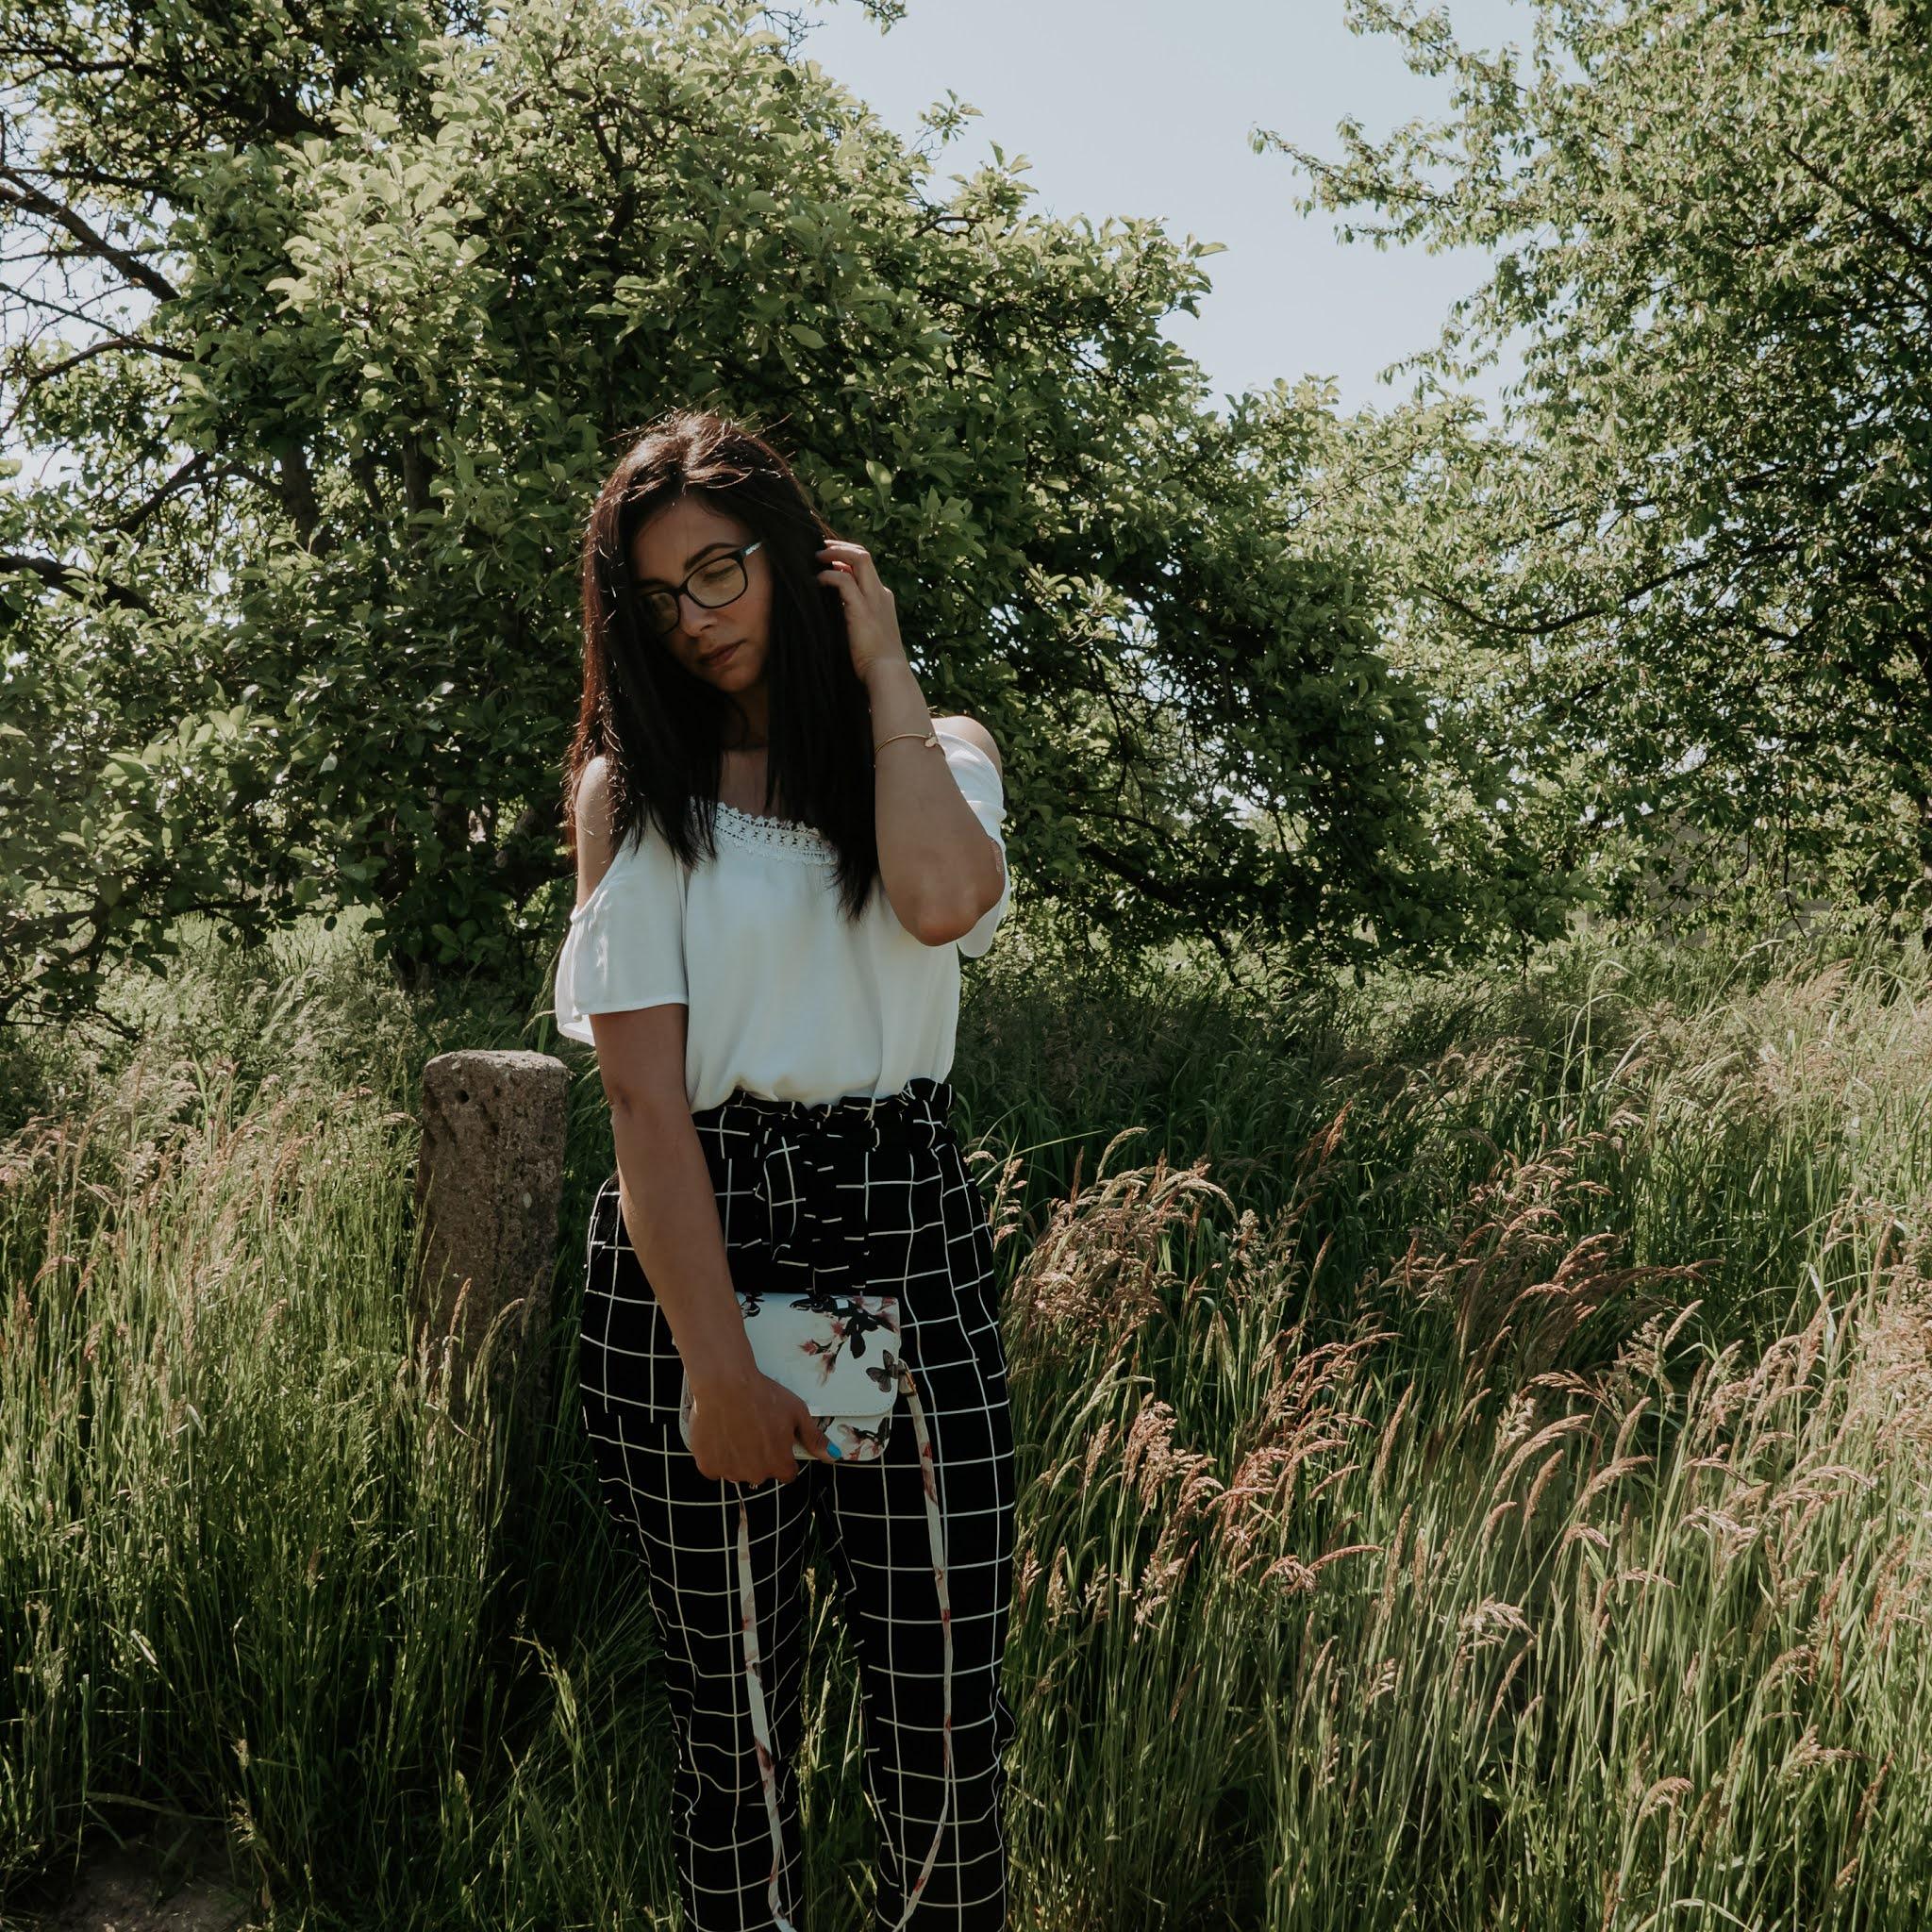 eleganckie spodnie i trampki